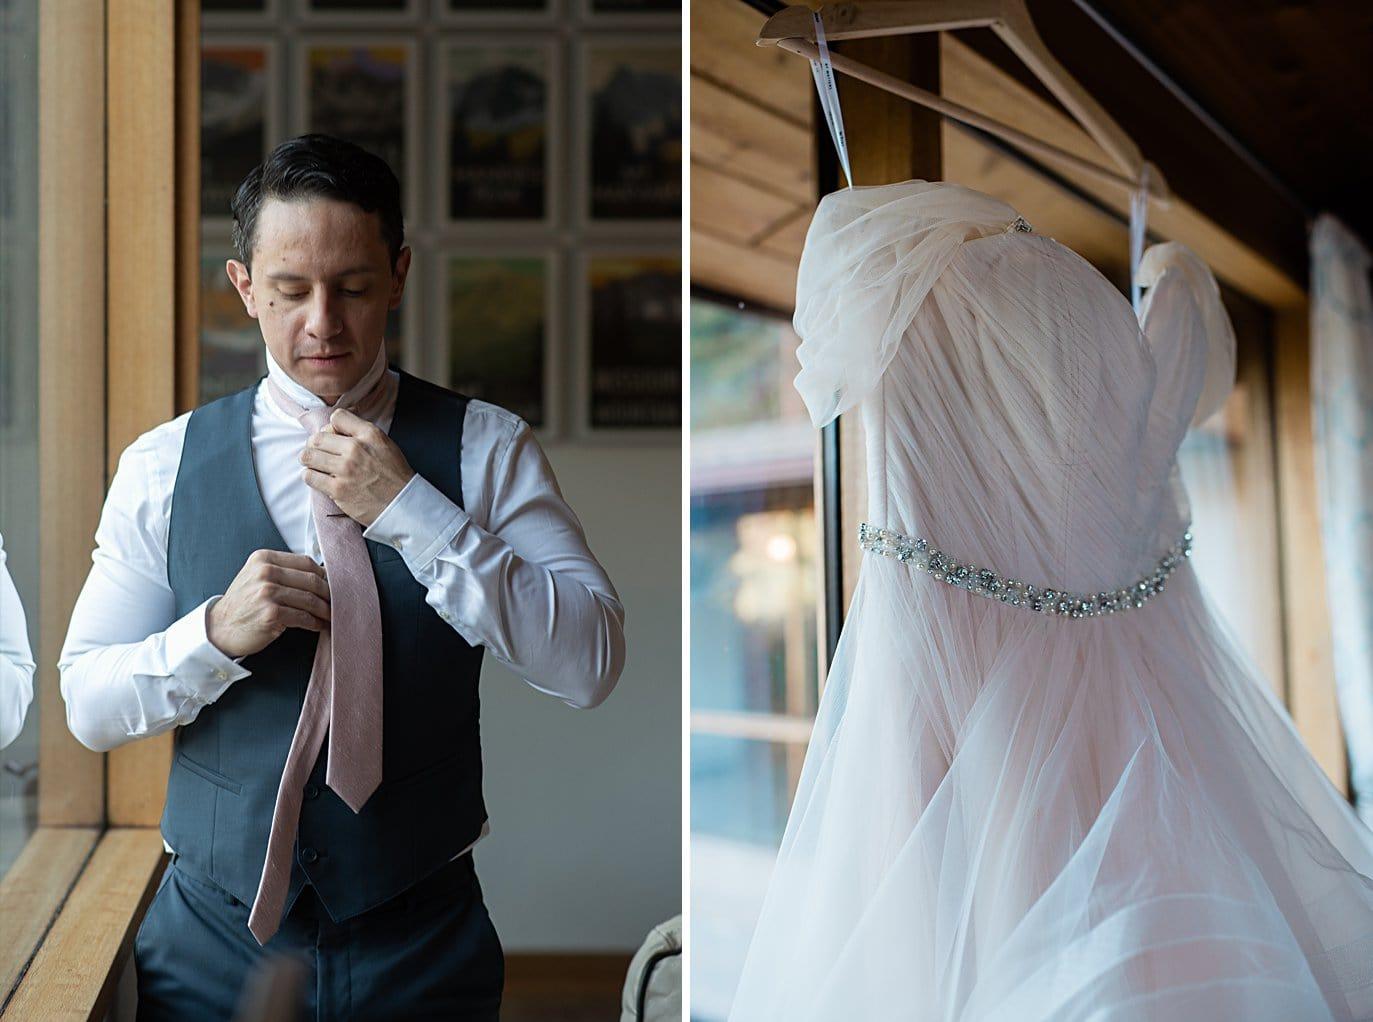 groom tying tie on wedding day at Colorado wedding by boulder wedding photographer Jennie Crate